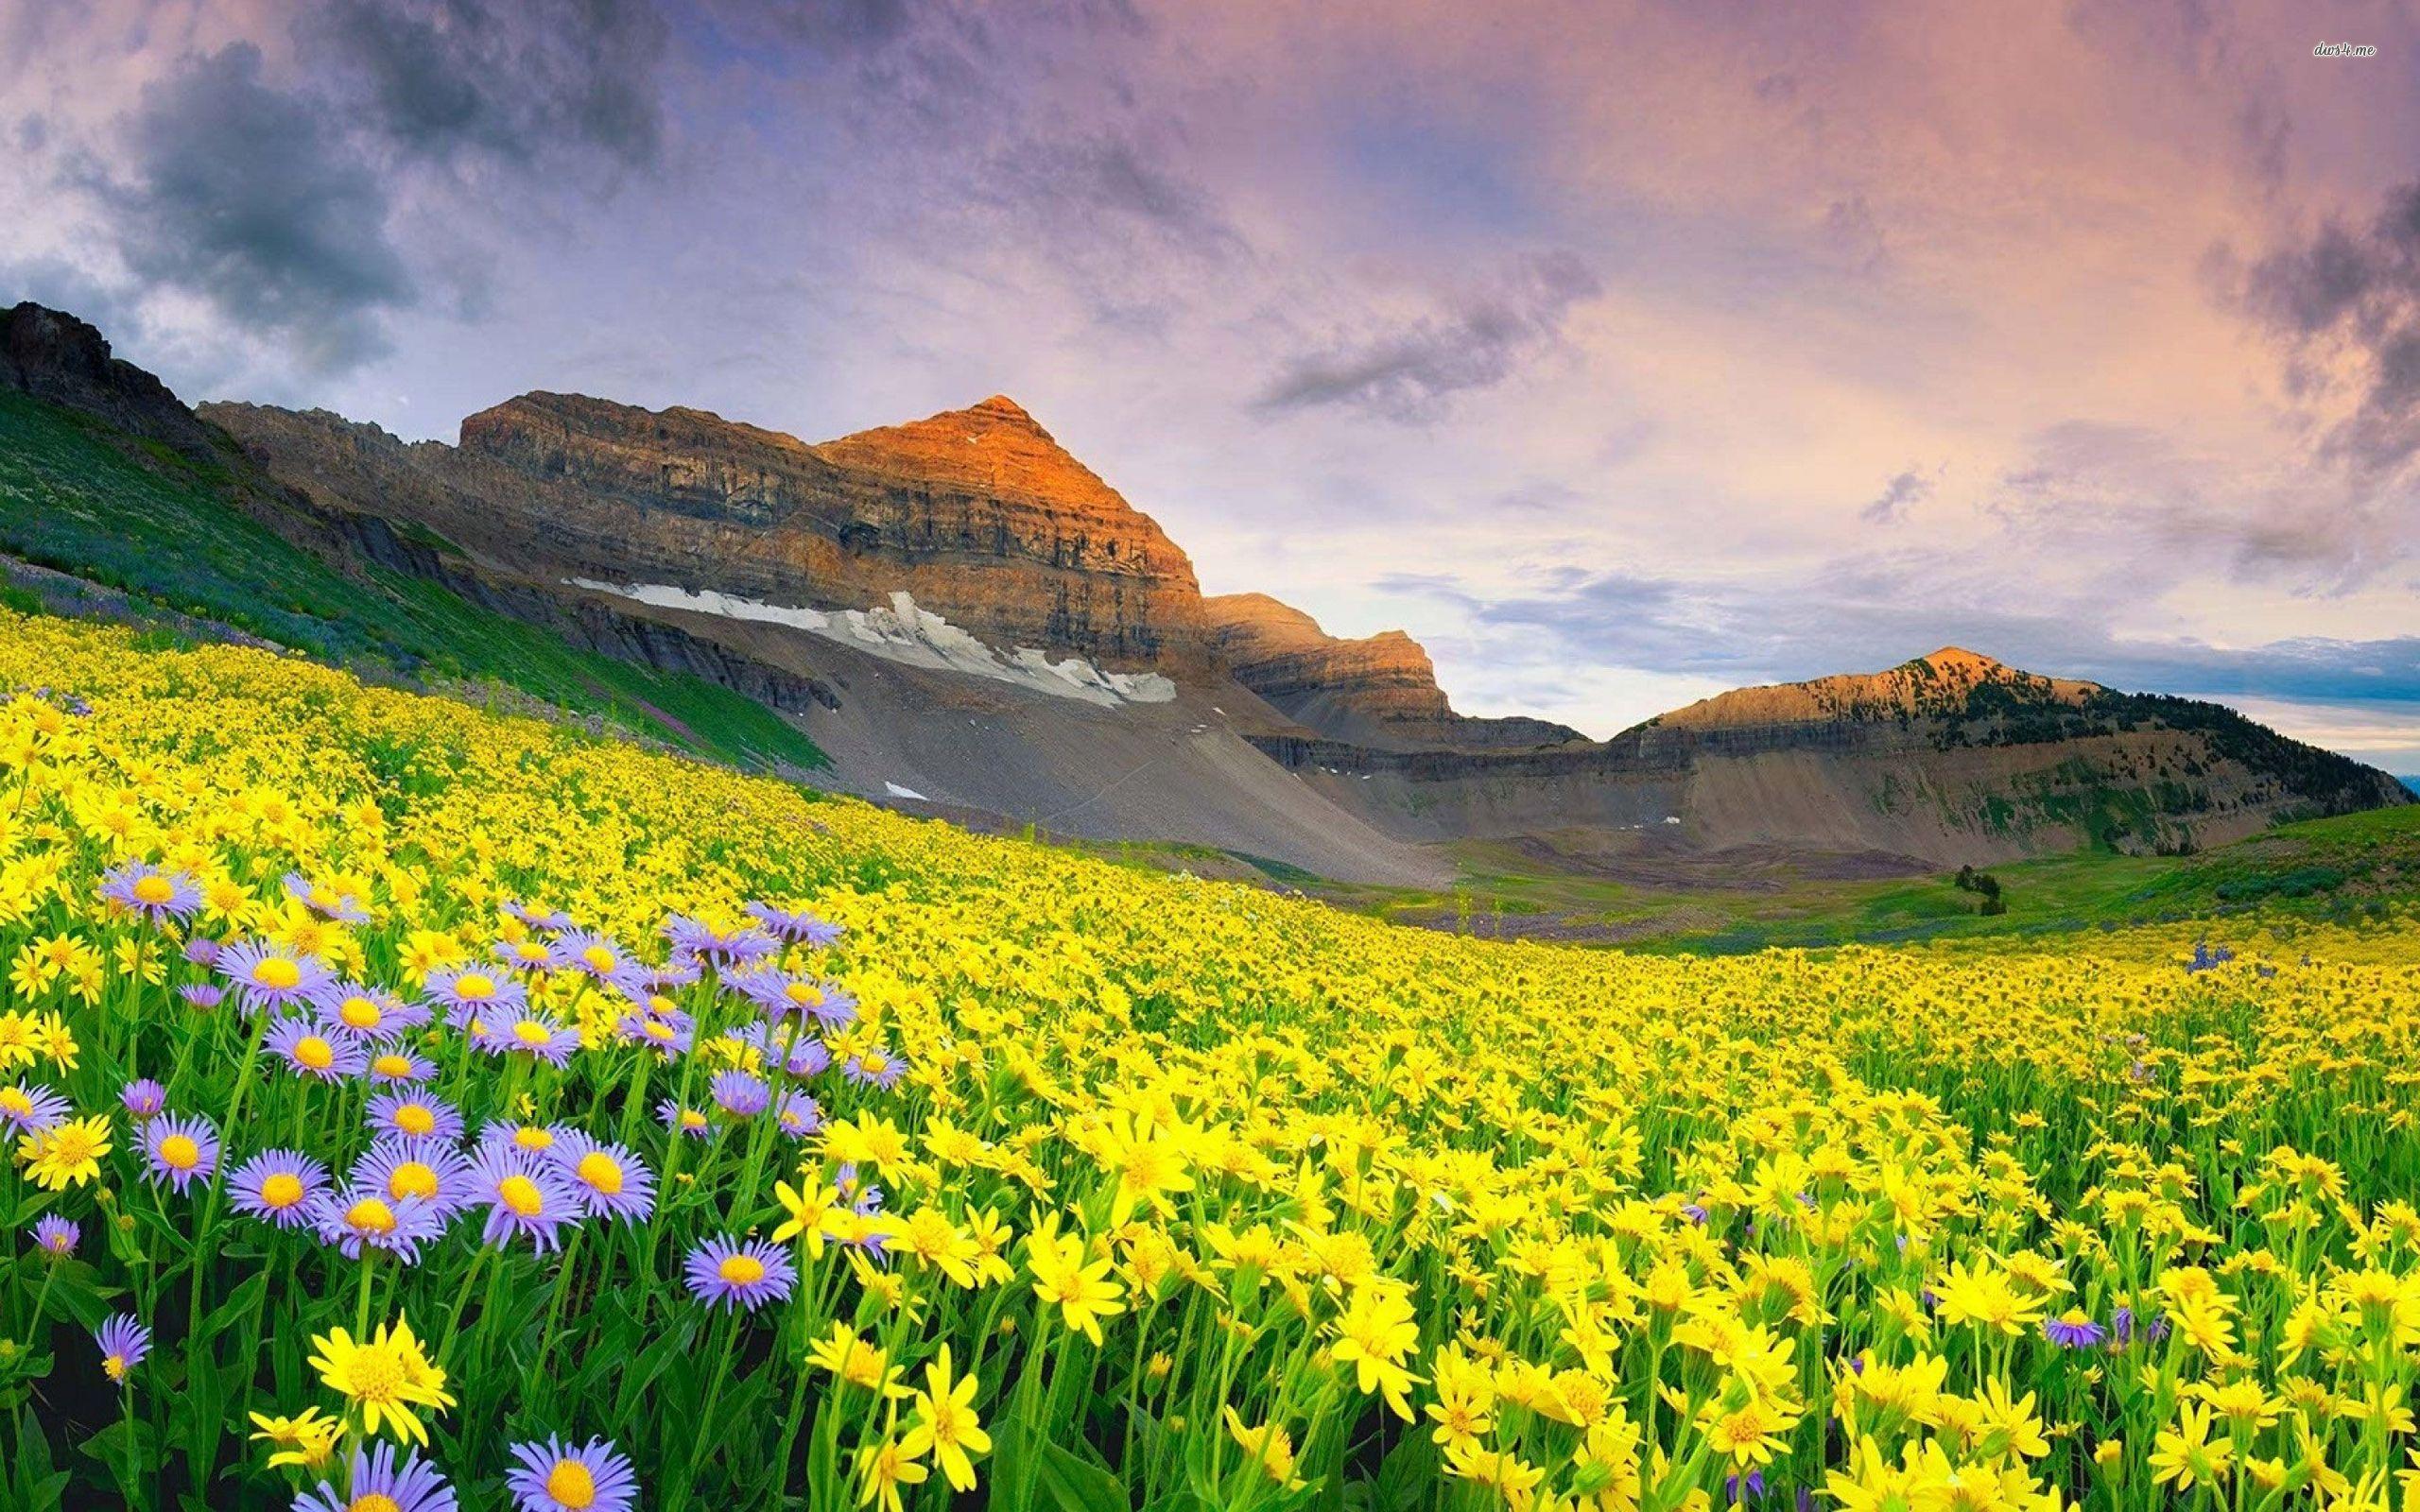 Flower Hd Wallpaper Background Image 2560x1600 Id 519243